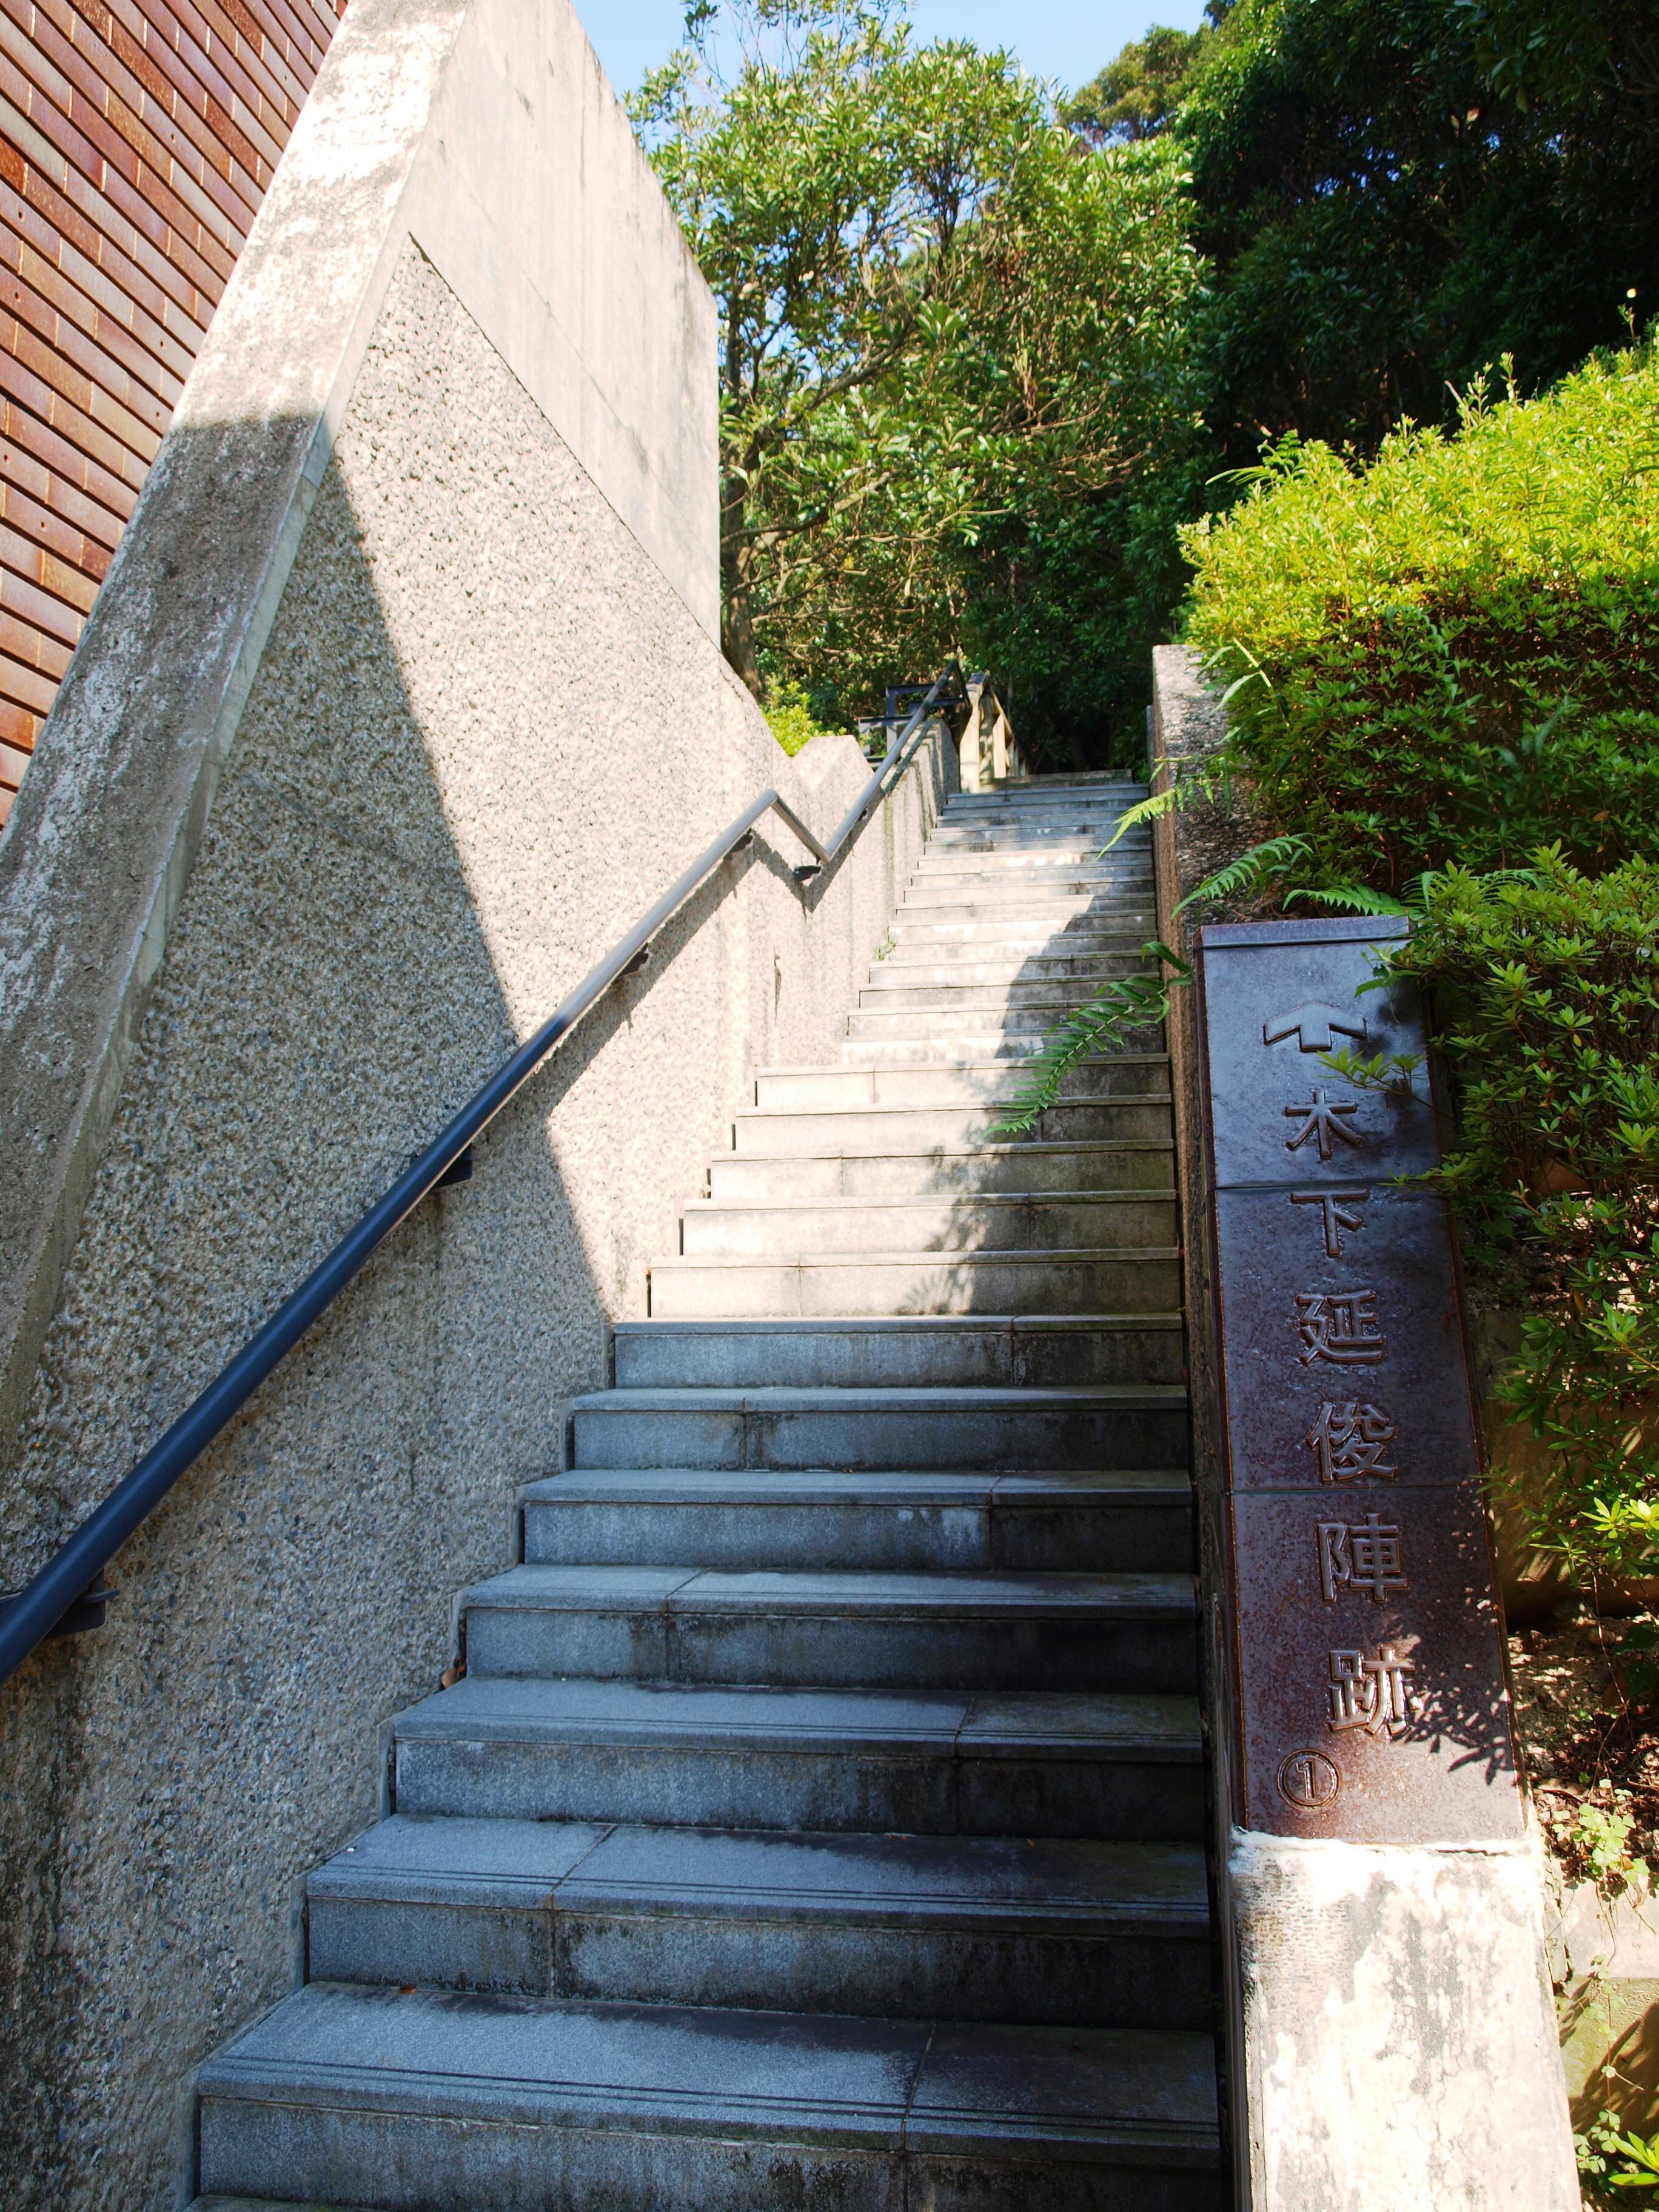 太閤秀吉唐入りの夢の跡、肥前名護屋城跡と佐賀県立名護屋城博物館